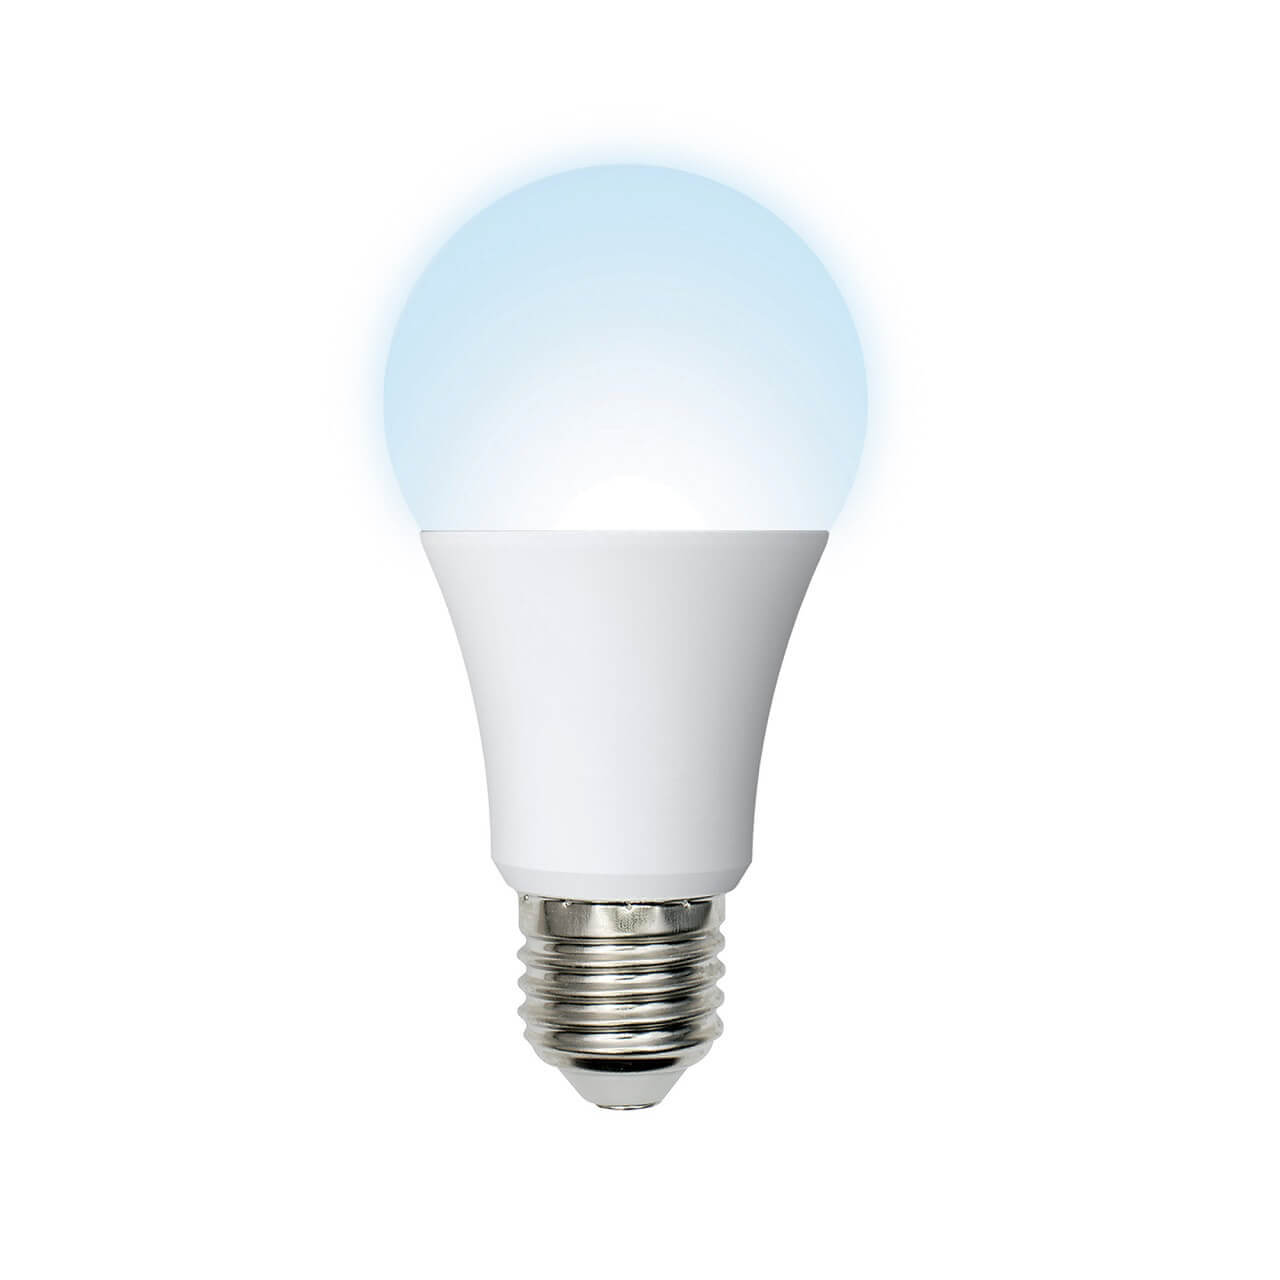 Лампа светодиодная (UL-00001065) E27 7W 4000K матовая LED-A60-7W/NW/E27/FR/O